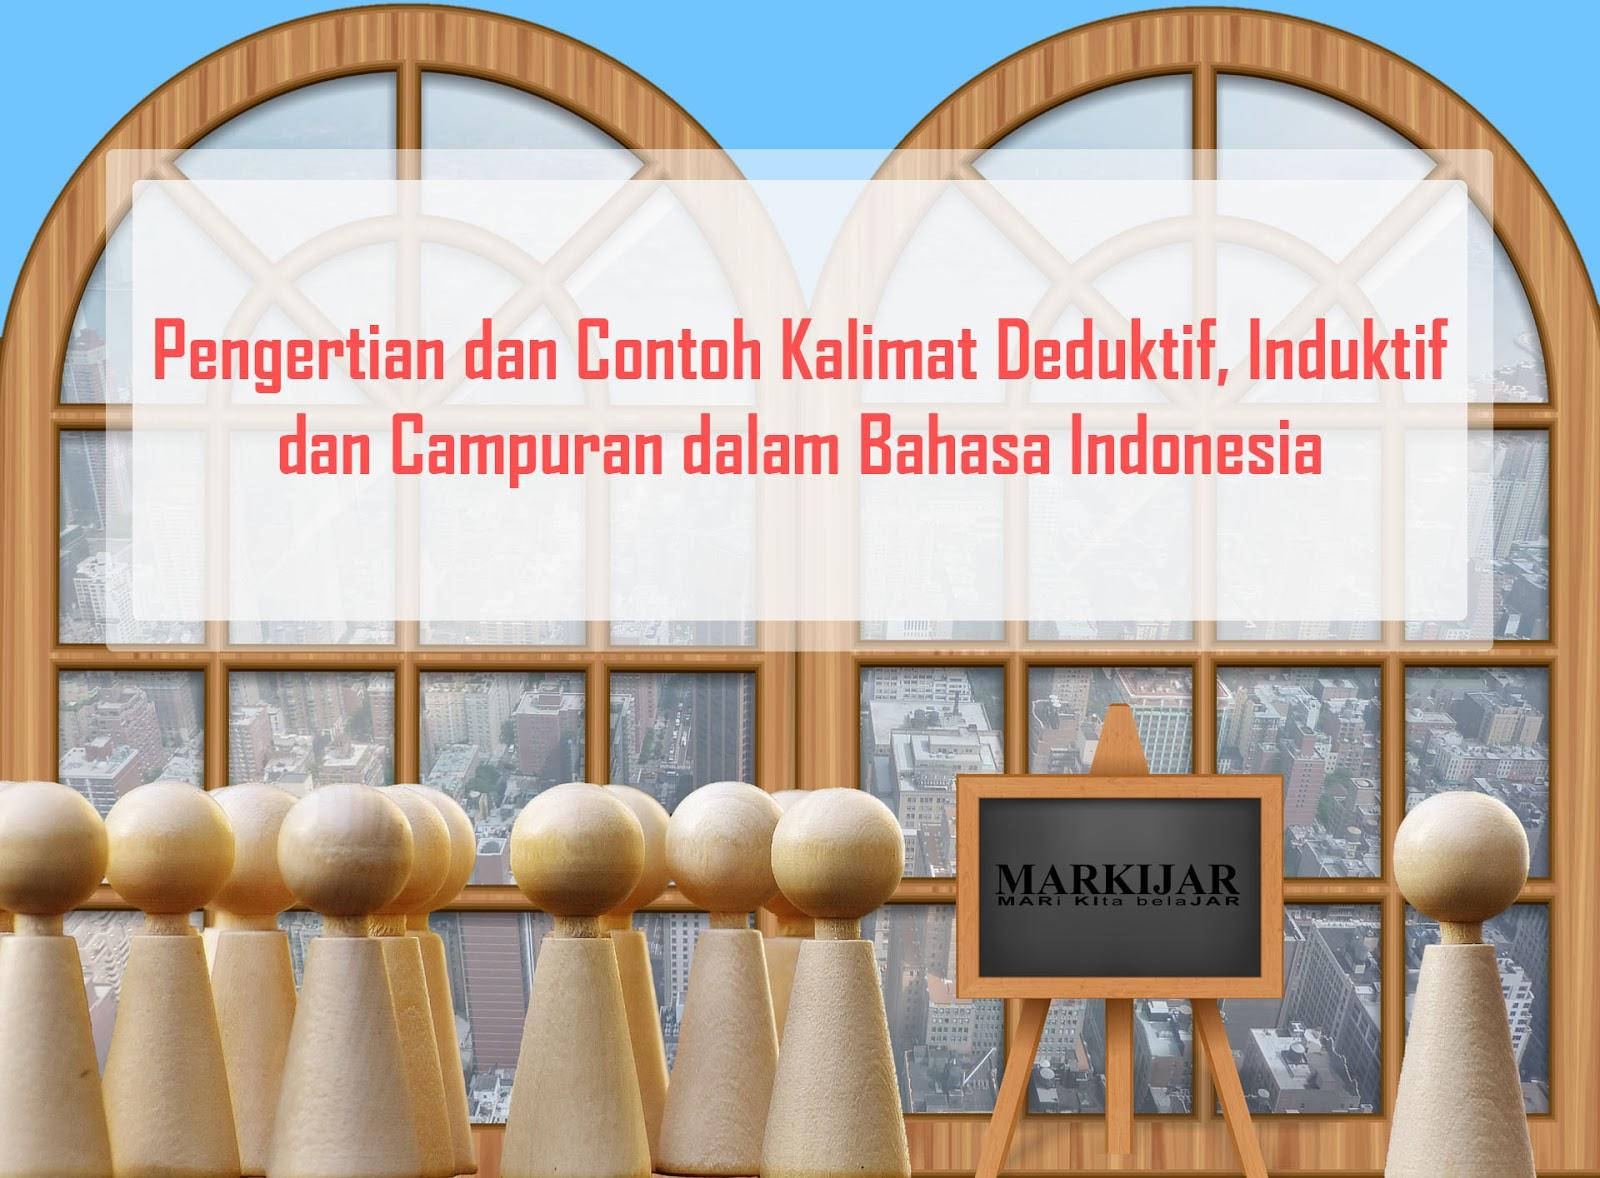 Pengertian Dan Contoh Kalimat Deduktif Induktif Dan Campuran Dalam Bahasa Indonesia Markijar Com